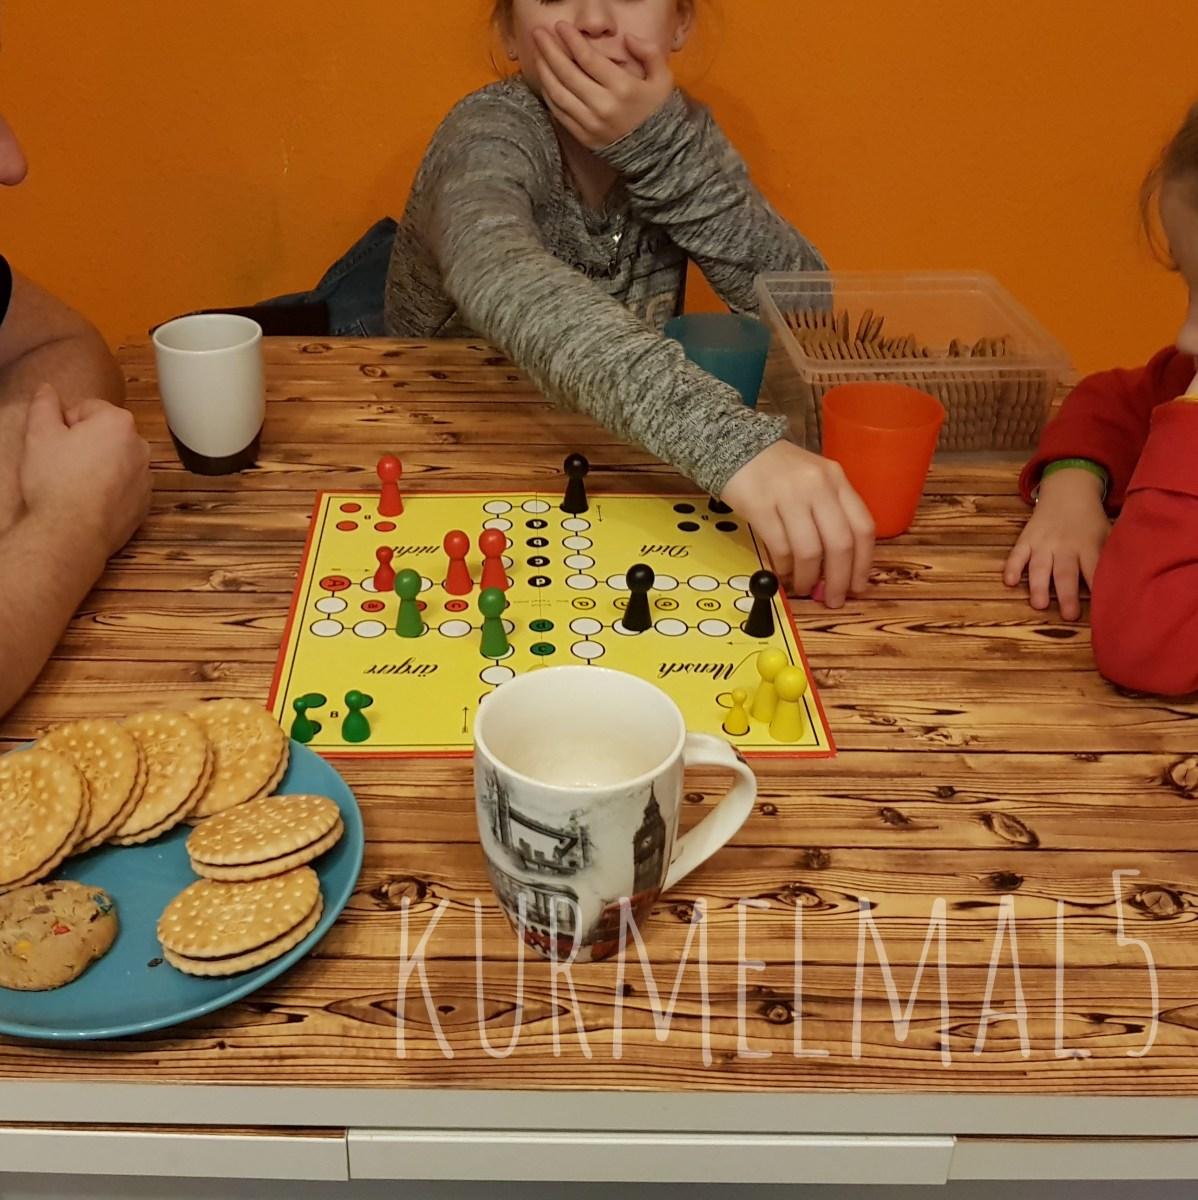 Spiele, Spieleklassiker, Gesellschaftsspiel, Kurmelmal5